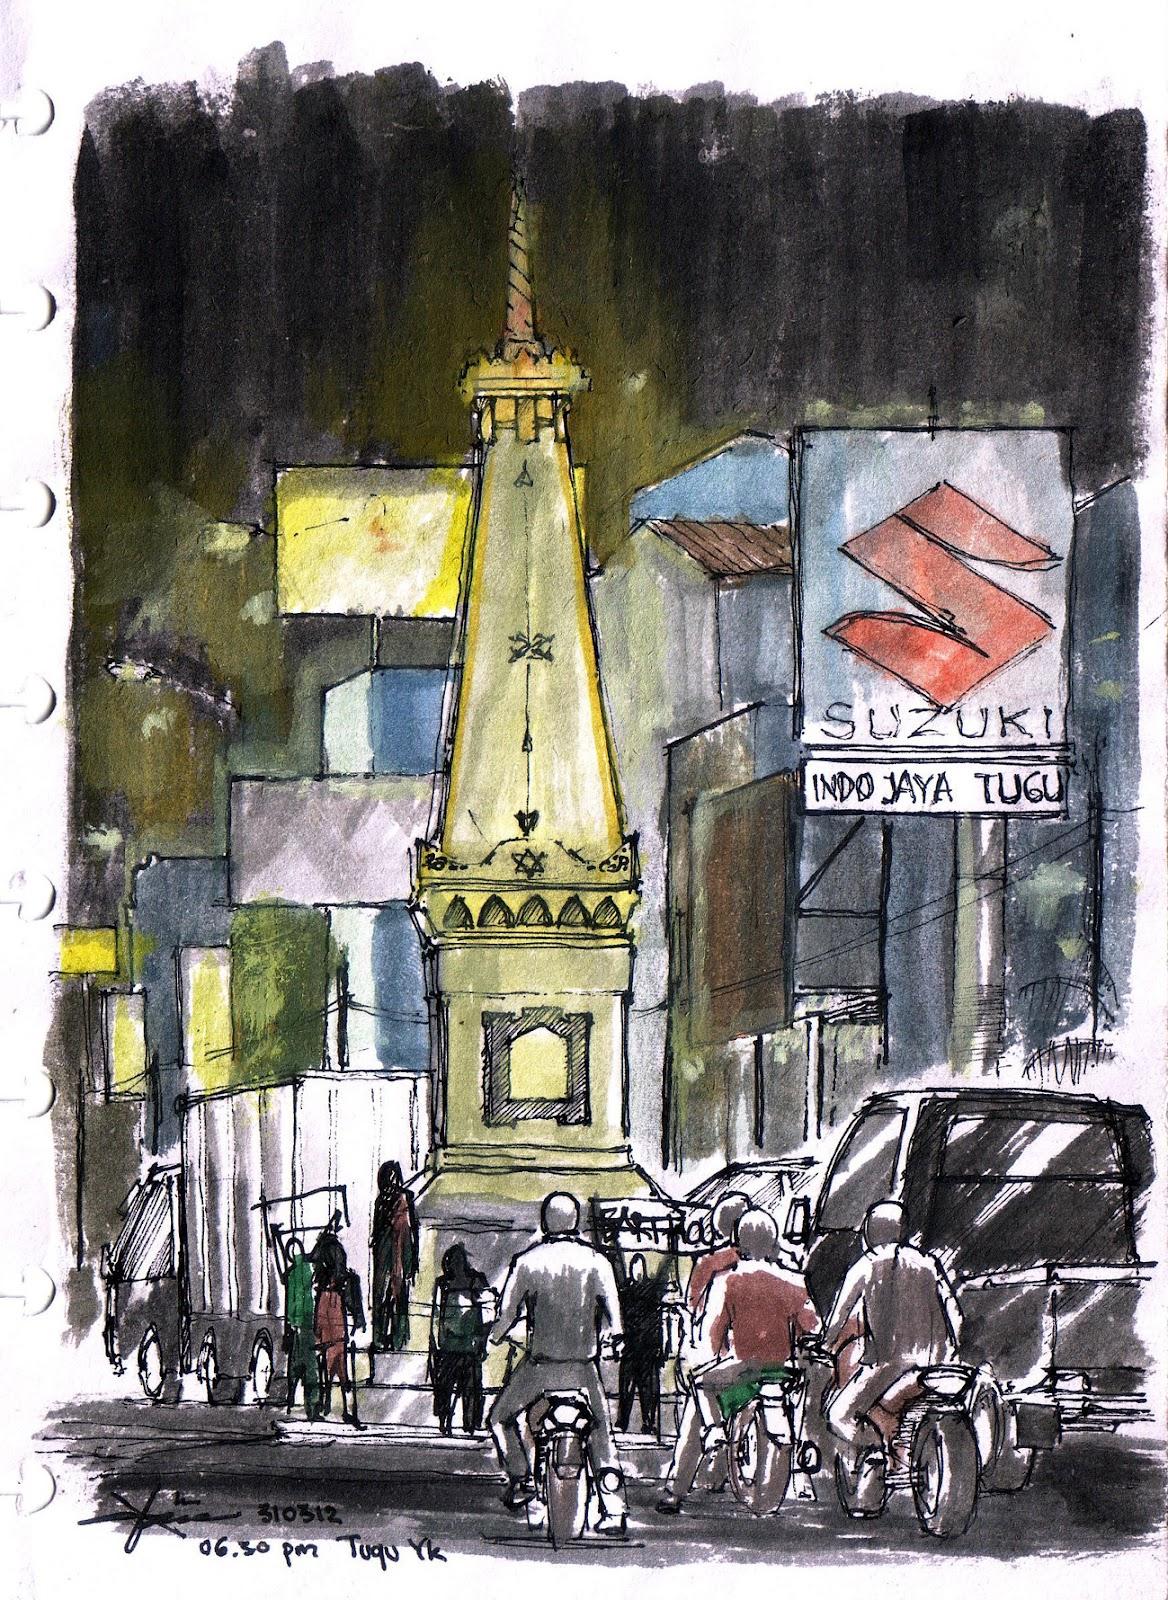 Kumpulan Sketsa Gambar Kota Seoul Sketsa Gambar